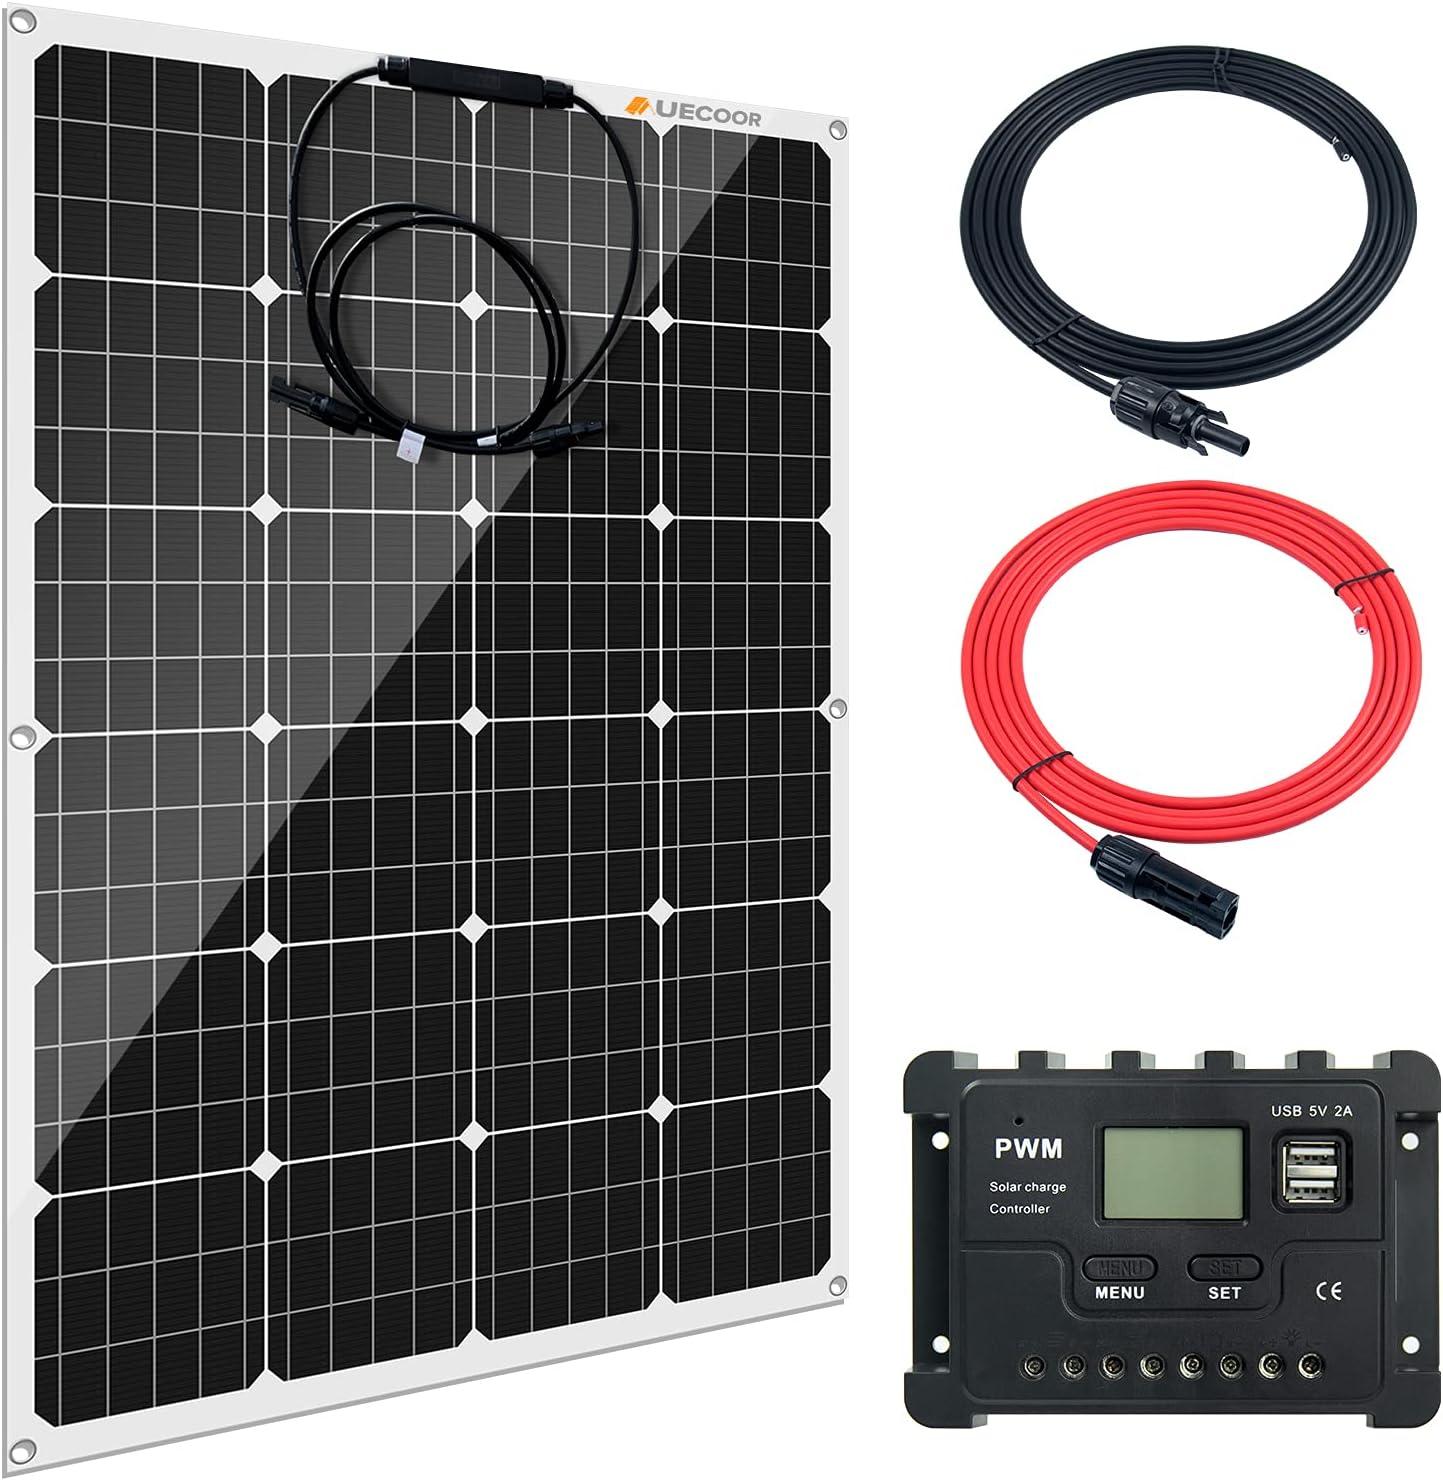 AUECOOR Dallas Mall 120 Watt 12 Volt Flexible Recommendation Panel Monocrystalline Solar Ki